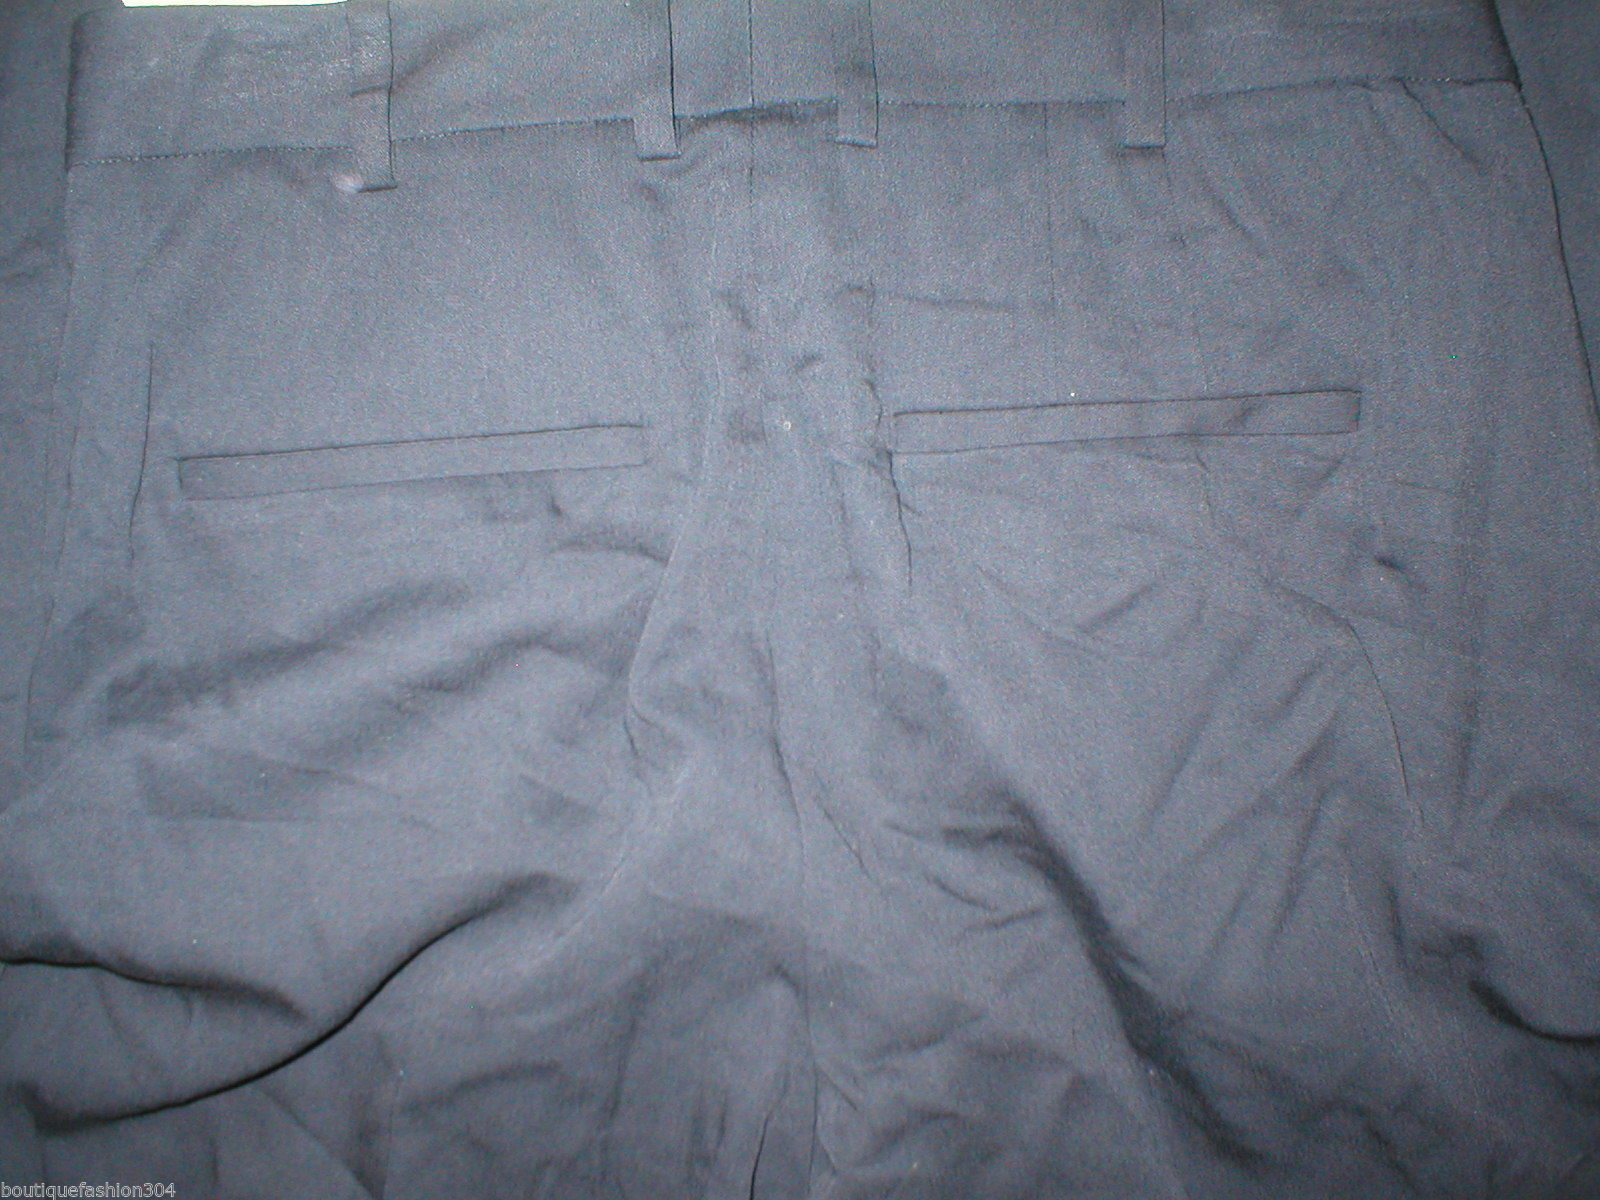 New Womens Black Navy Blue Designer Elie Tahari Linen Pants 28 X 25.5 Crop Capri